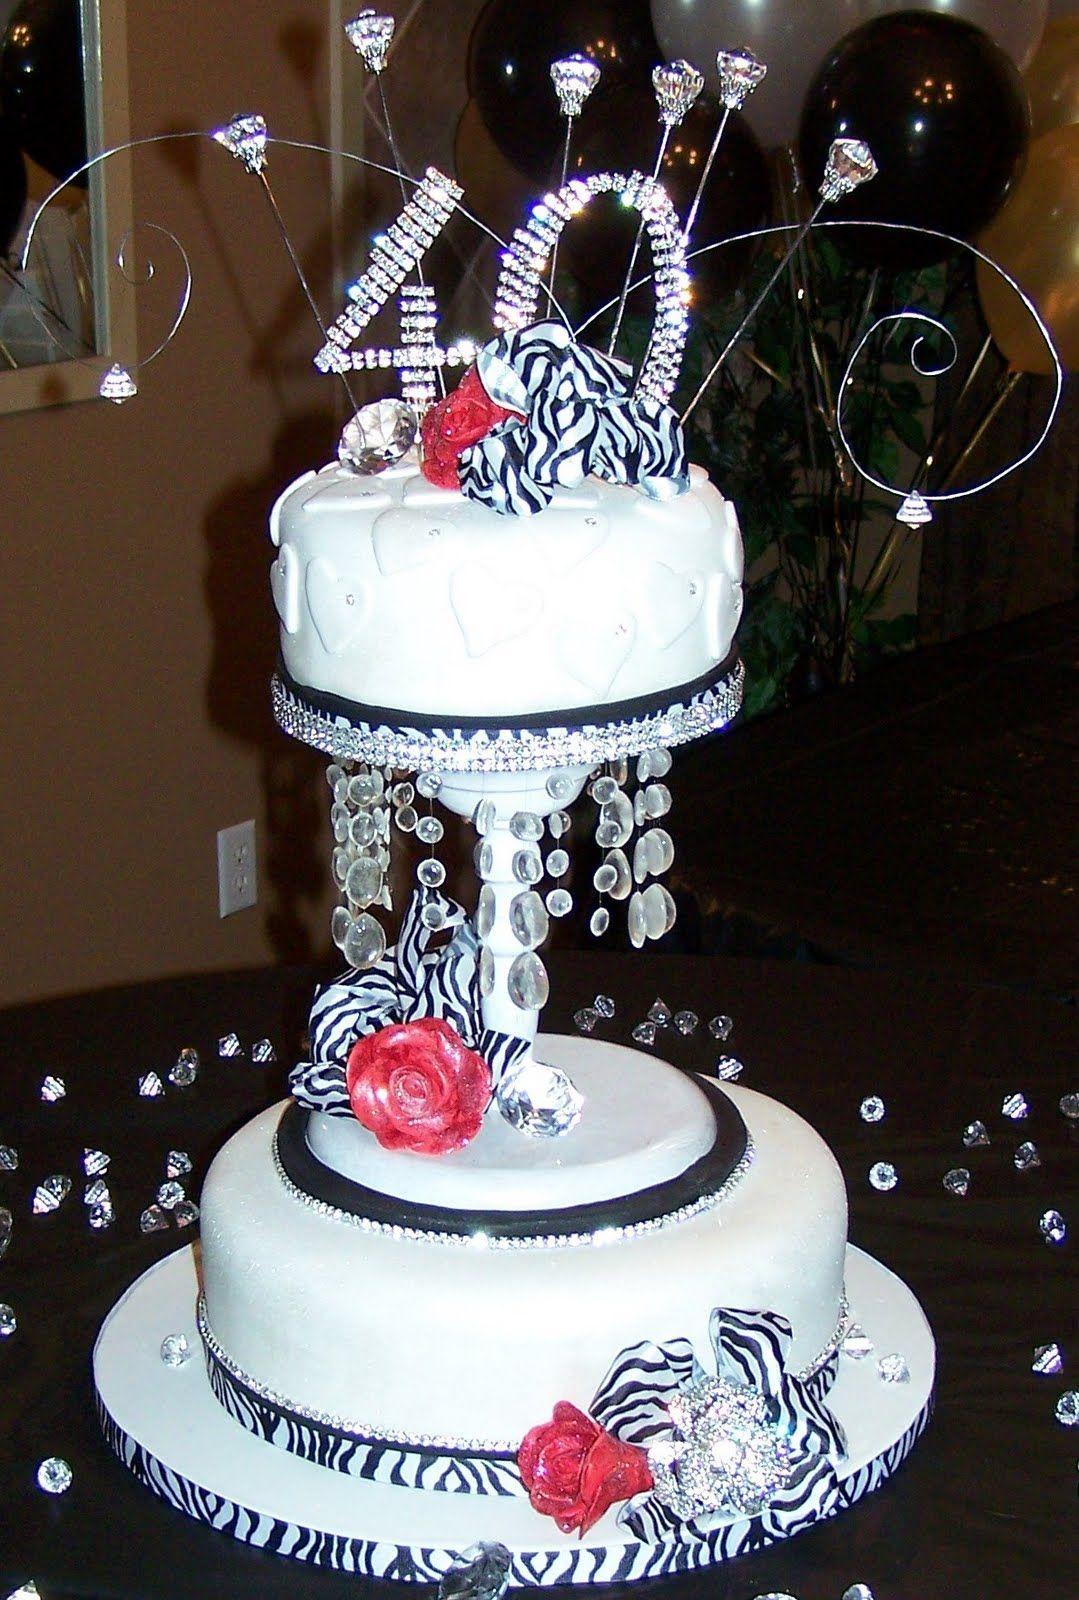 Bling Birthday Cake Designs Pin 40th Birthday Cake Ideas